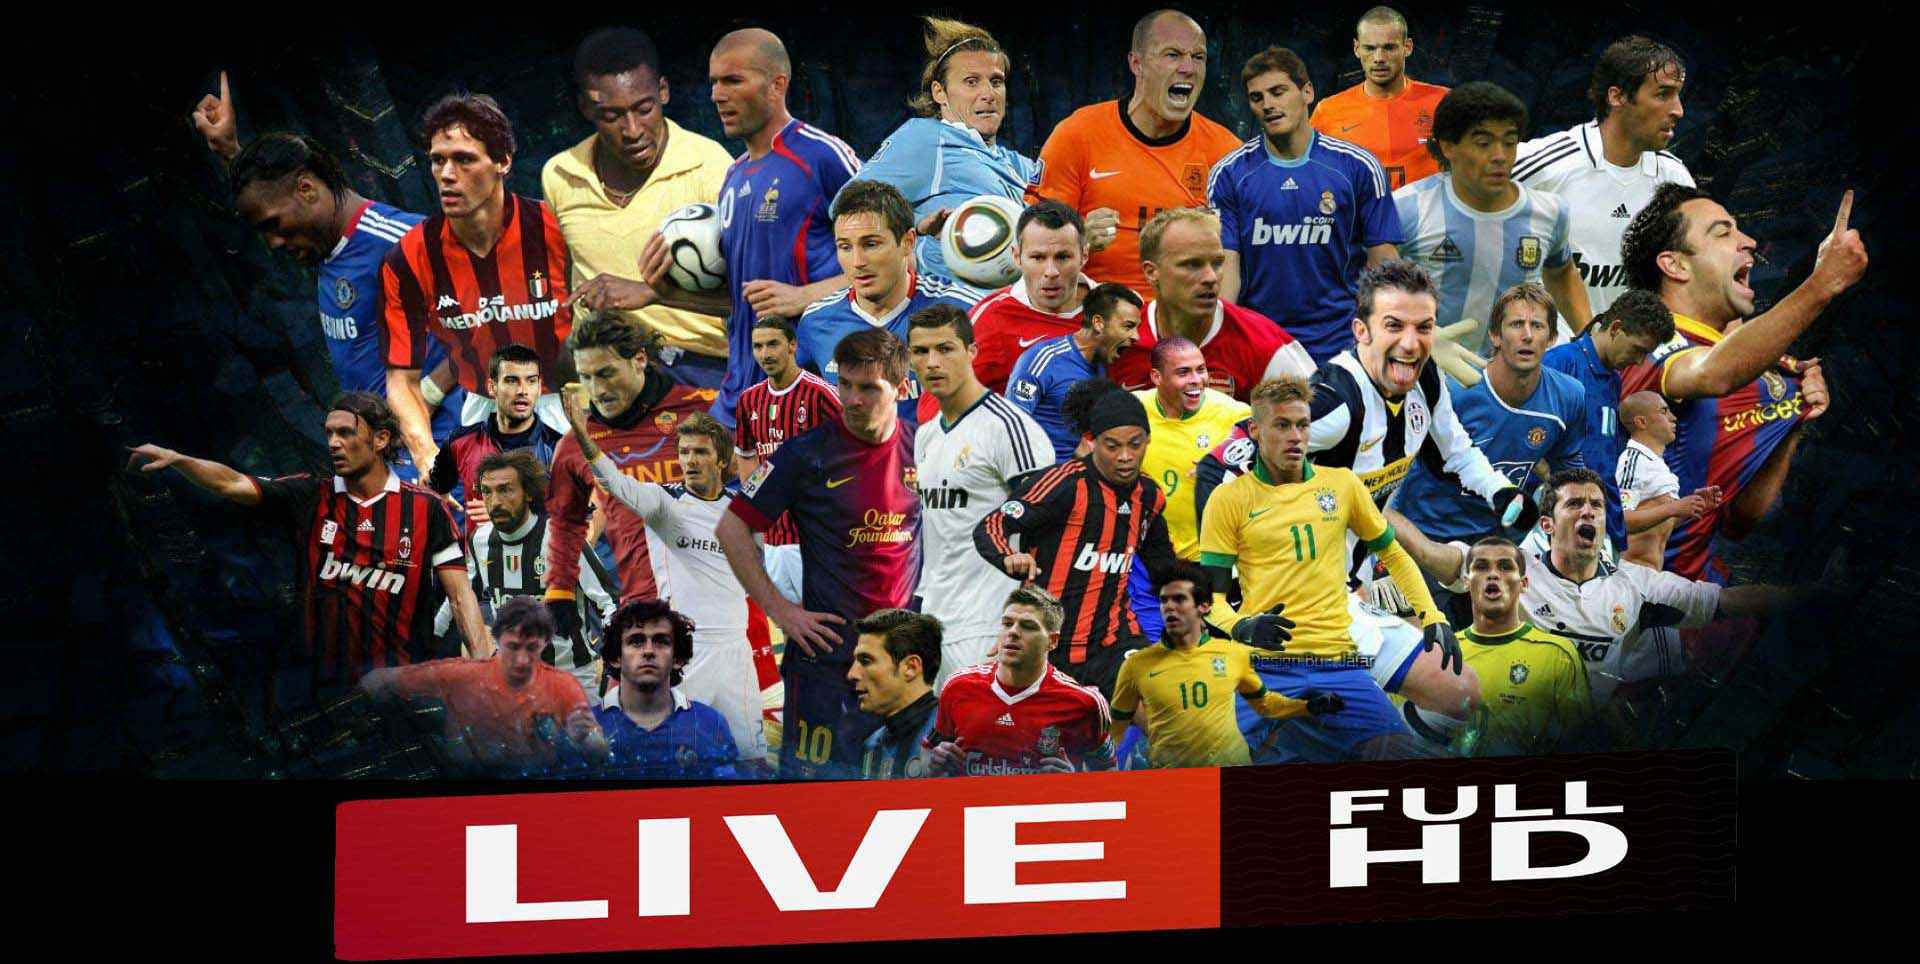 watch-besiktas-vs-dynamo-kyiv-uefa-live